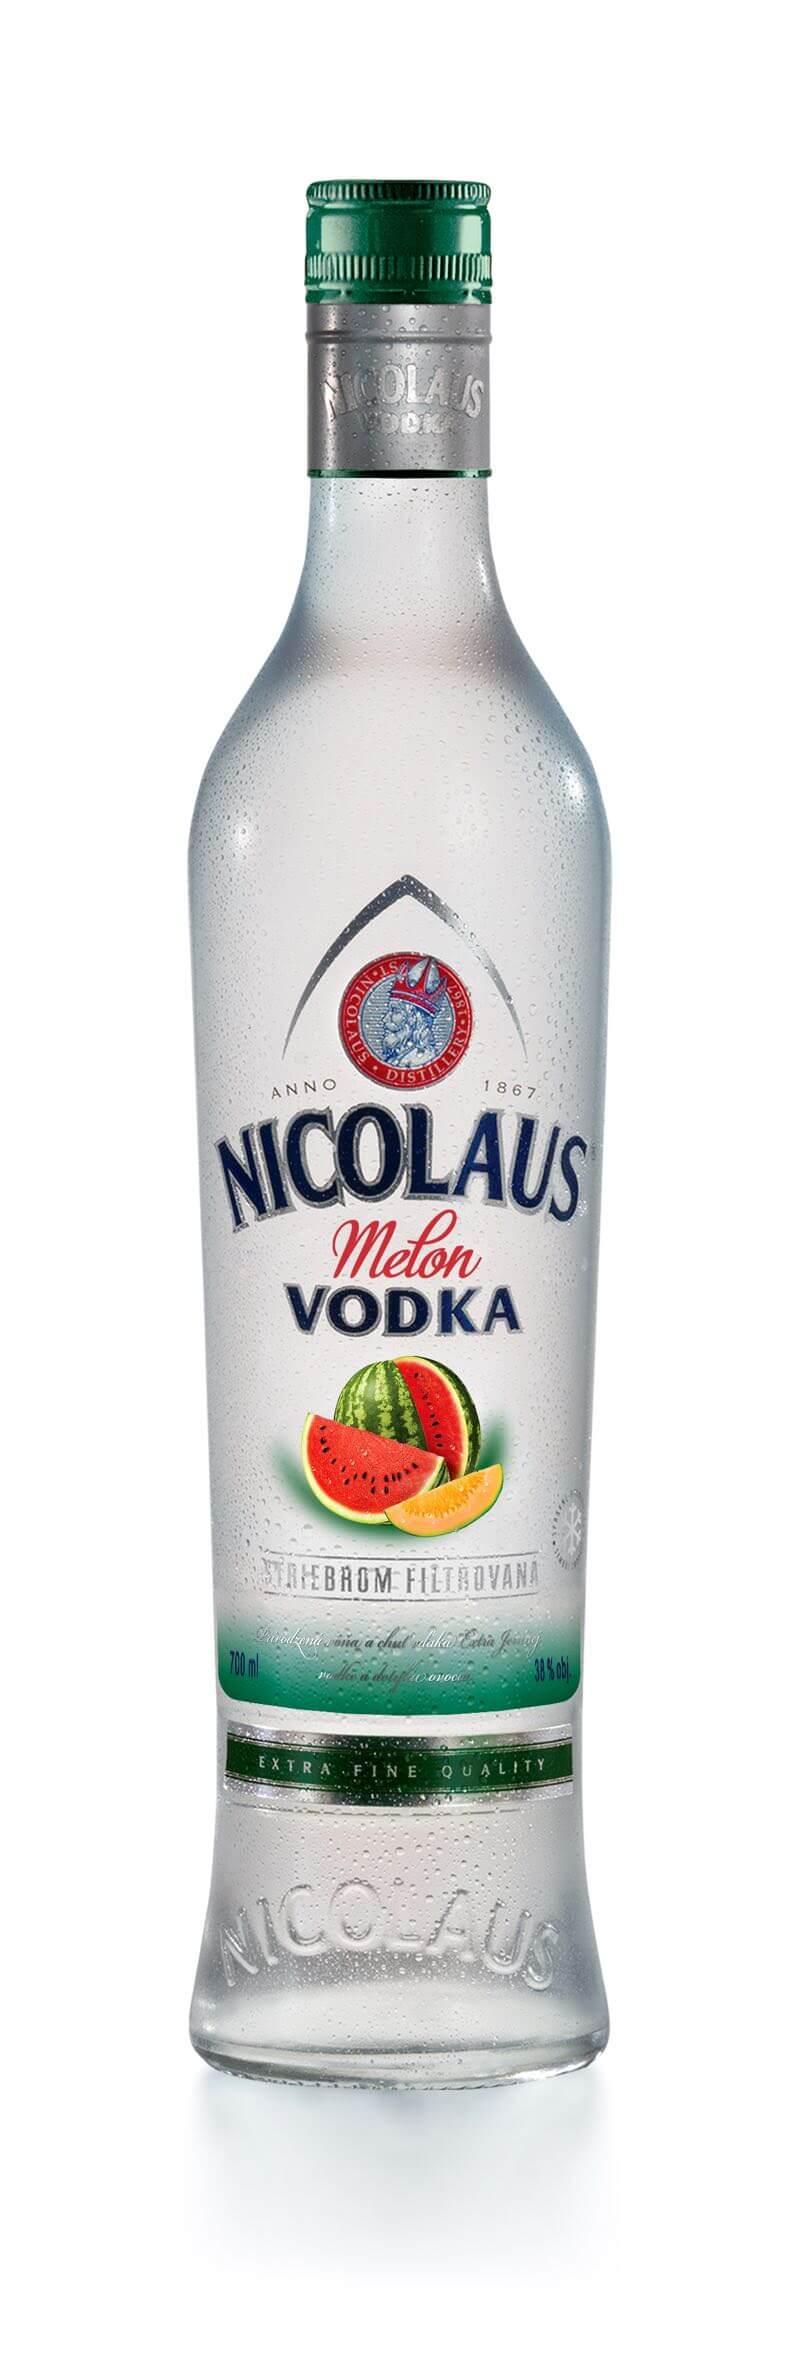 Nicolaus Melon Vodka 38% 0,7l